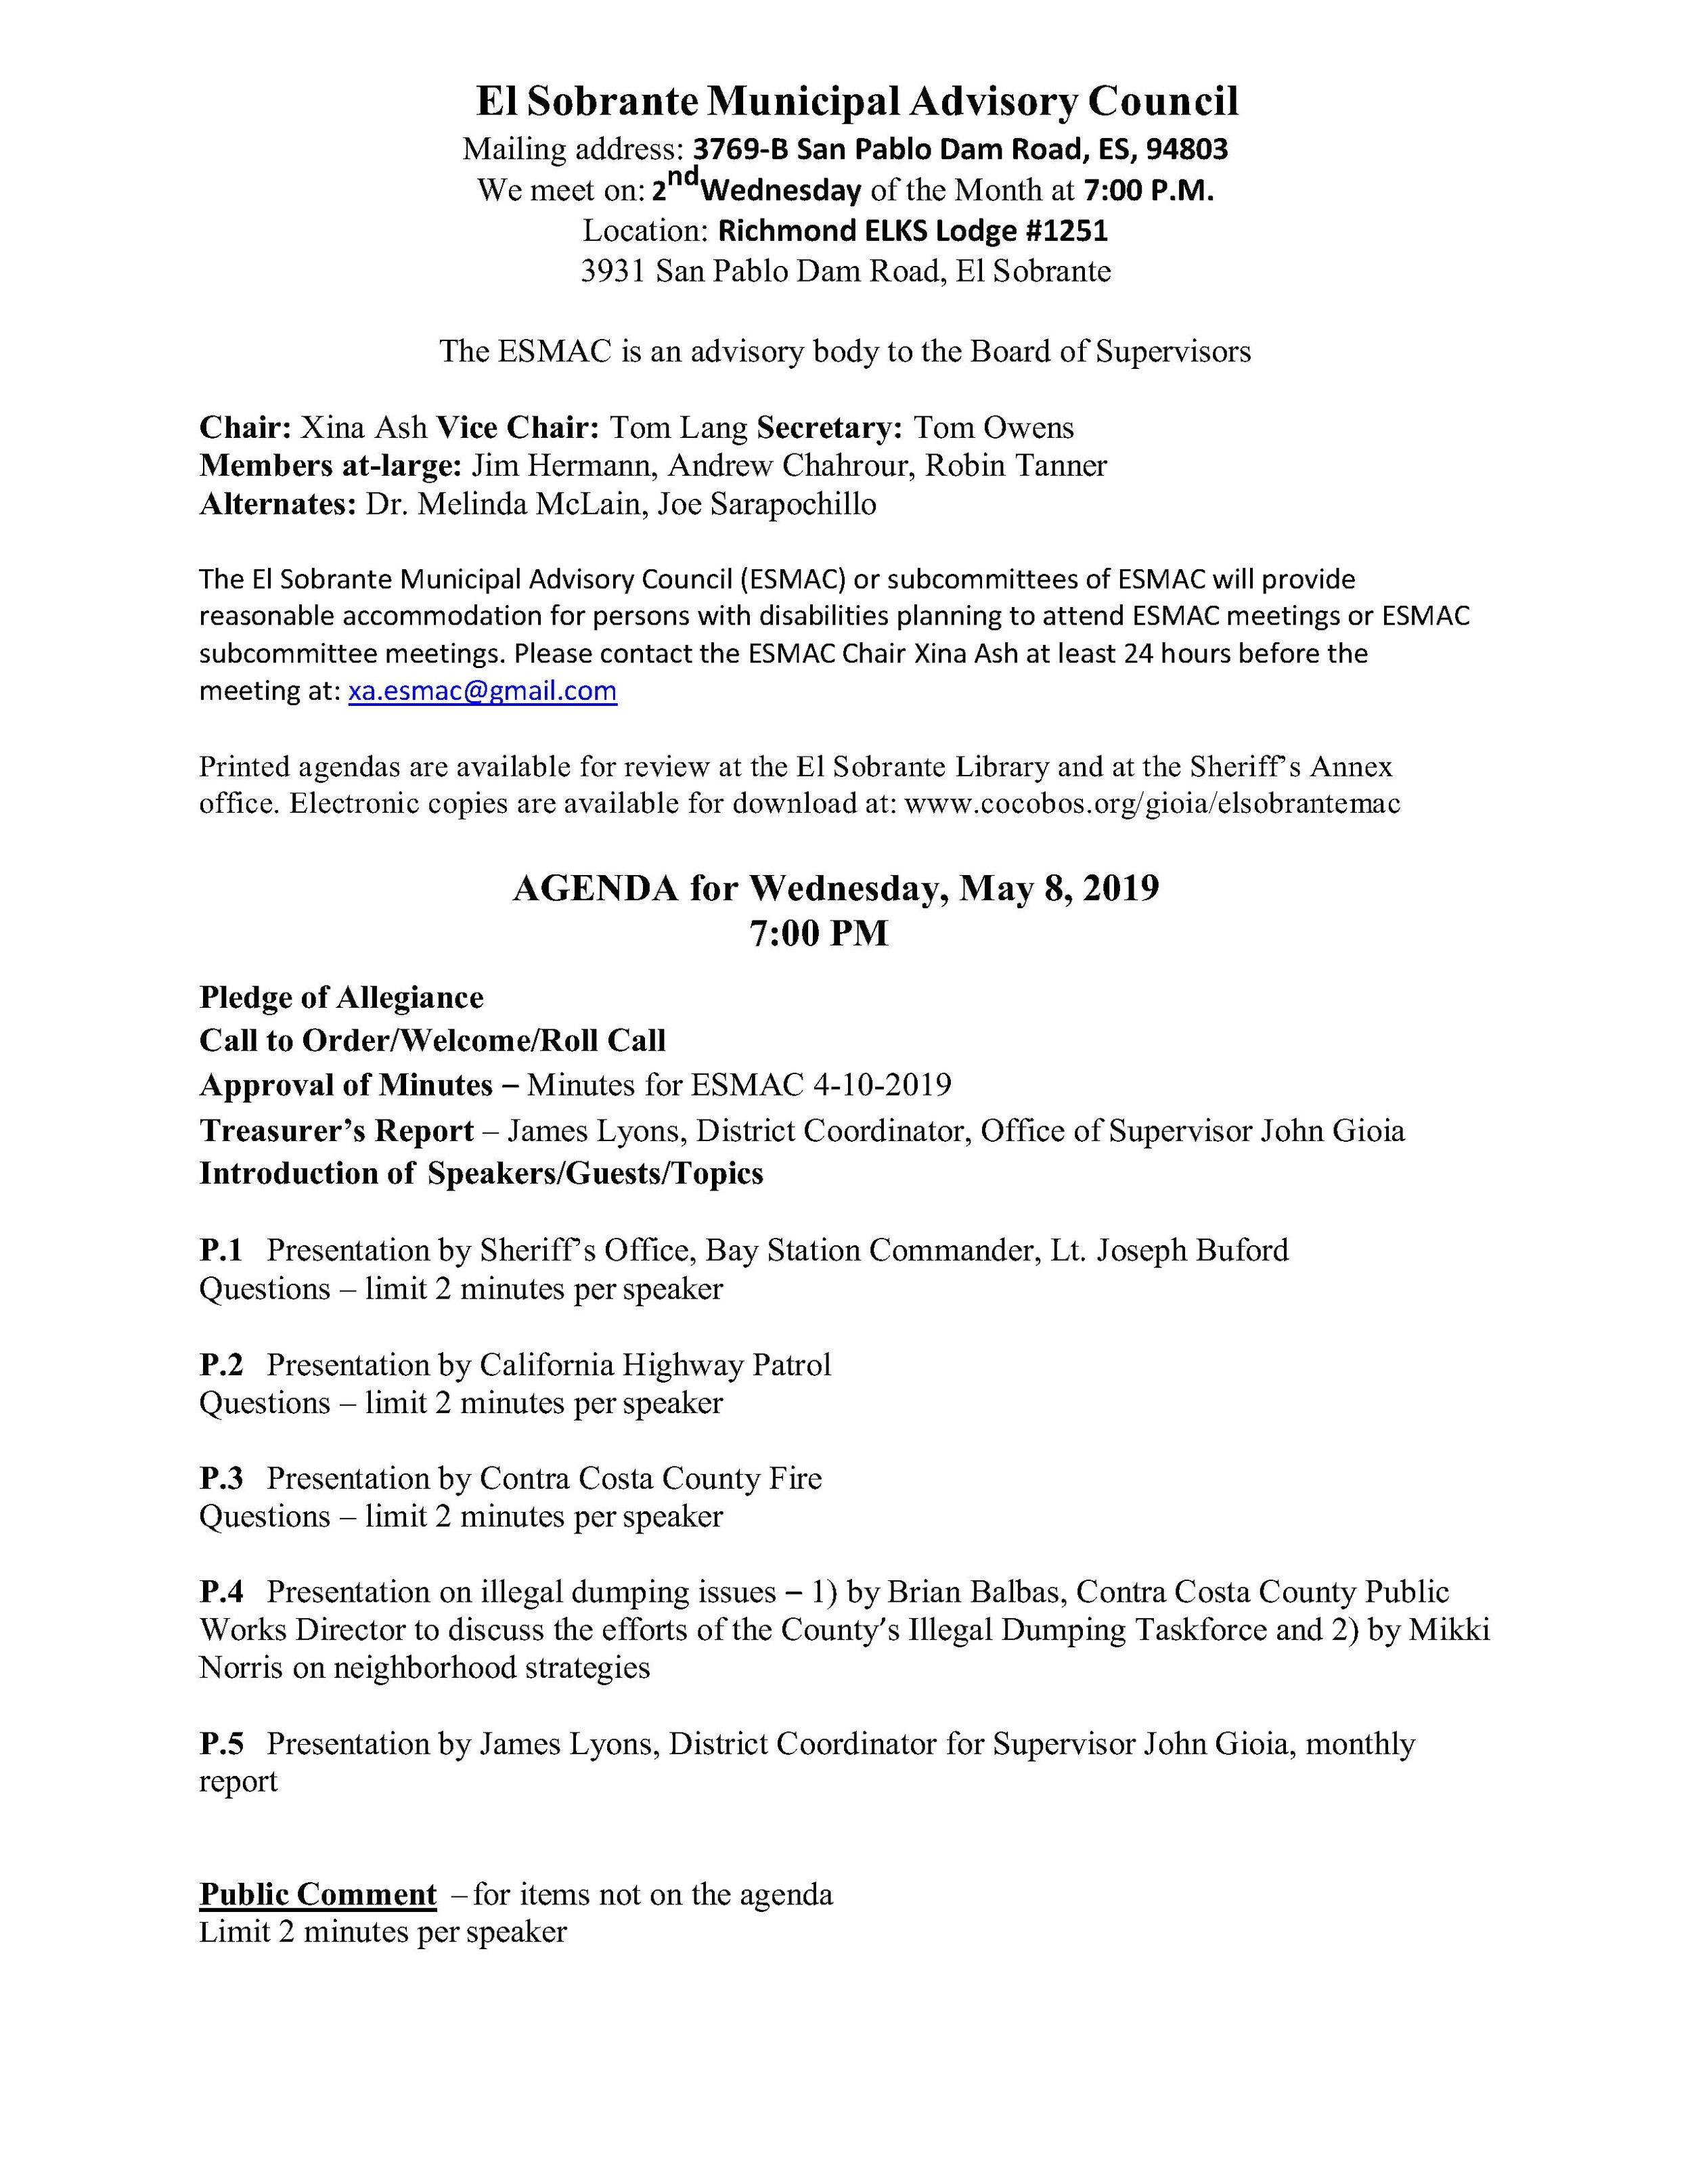 ESMAC Agenda 5.8.2019b_1.jpg